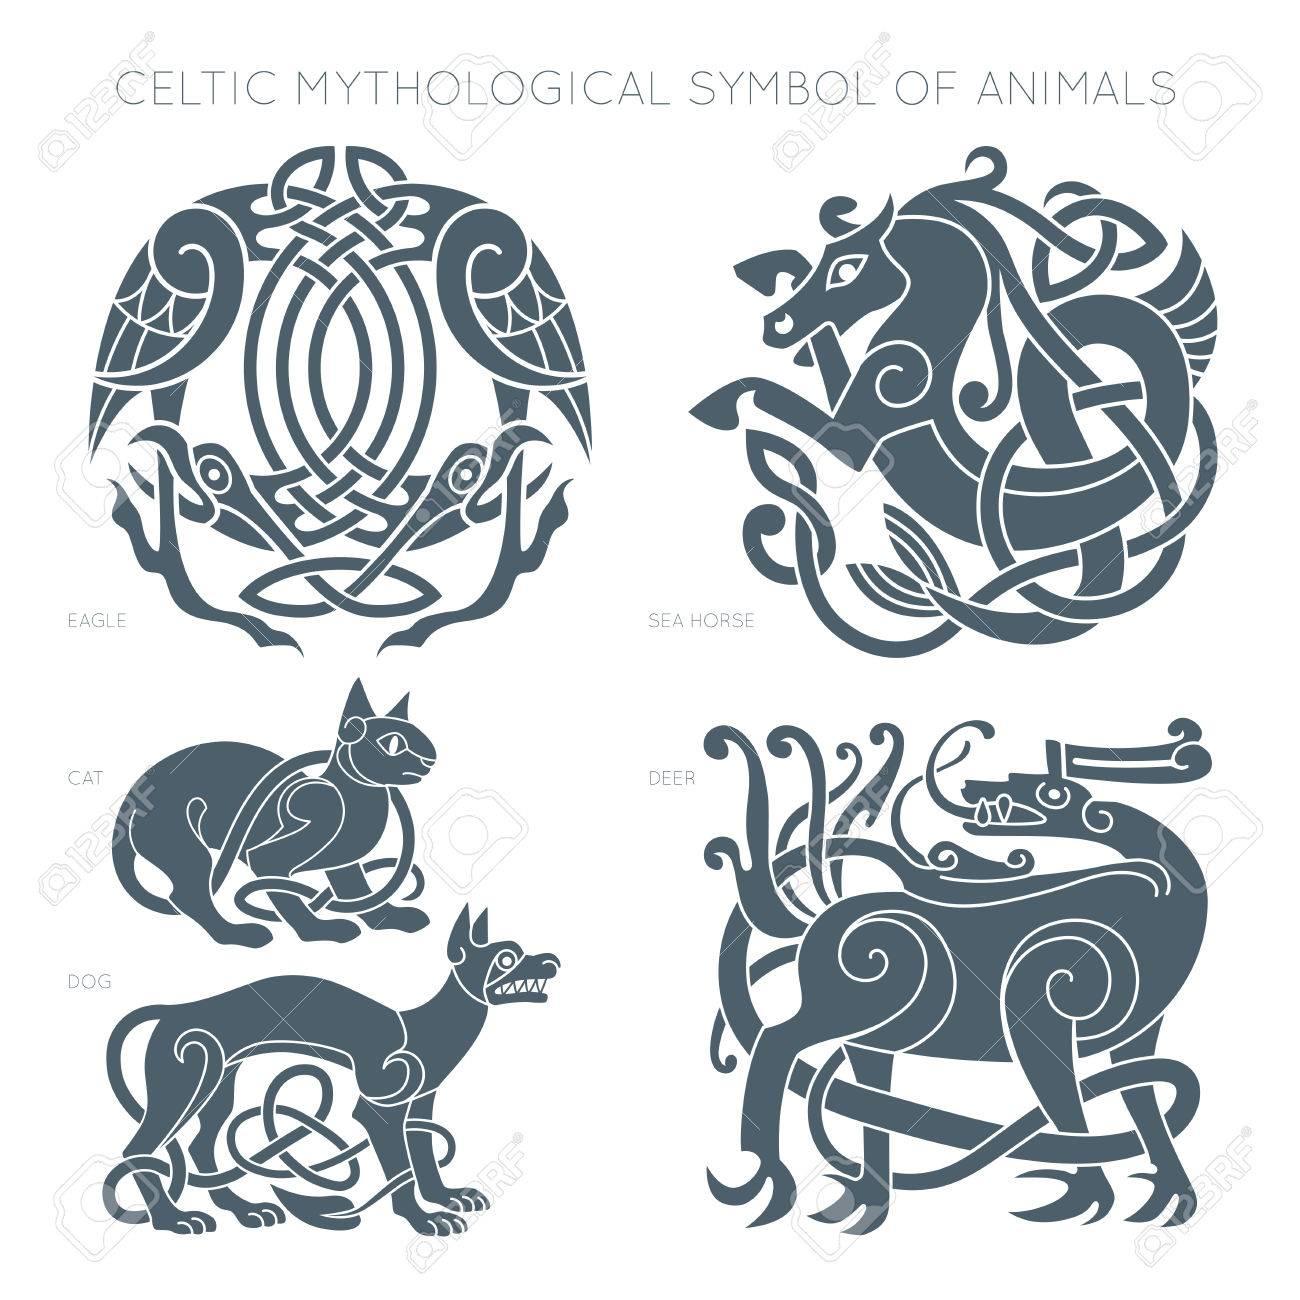 Ancient Celtic Mythological Symbol Of Animals Vector Illustrati